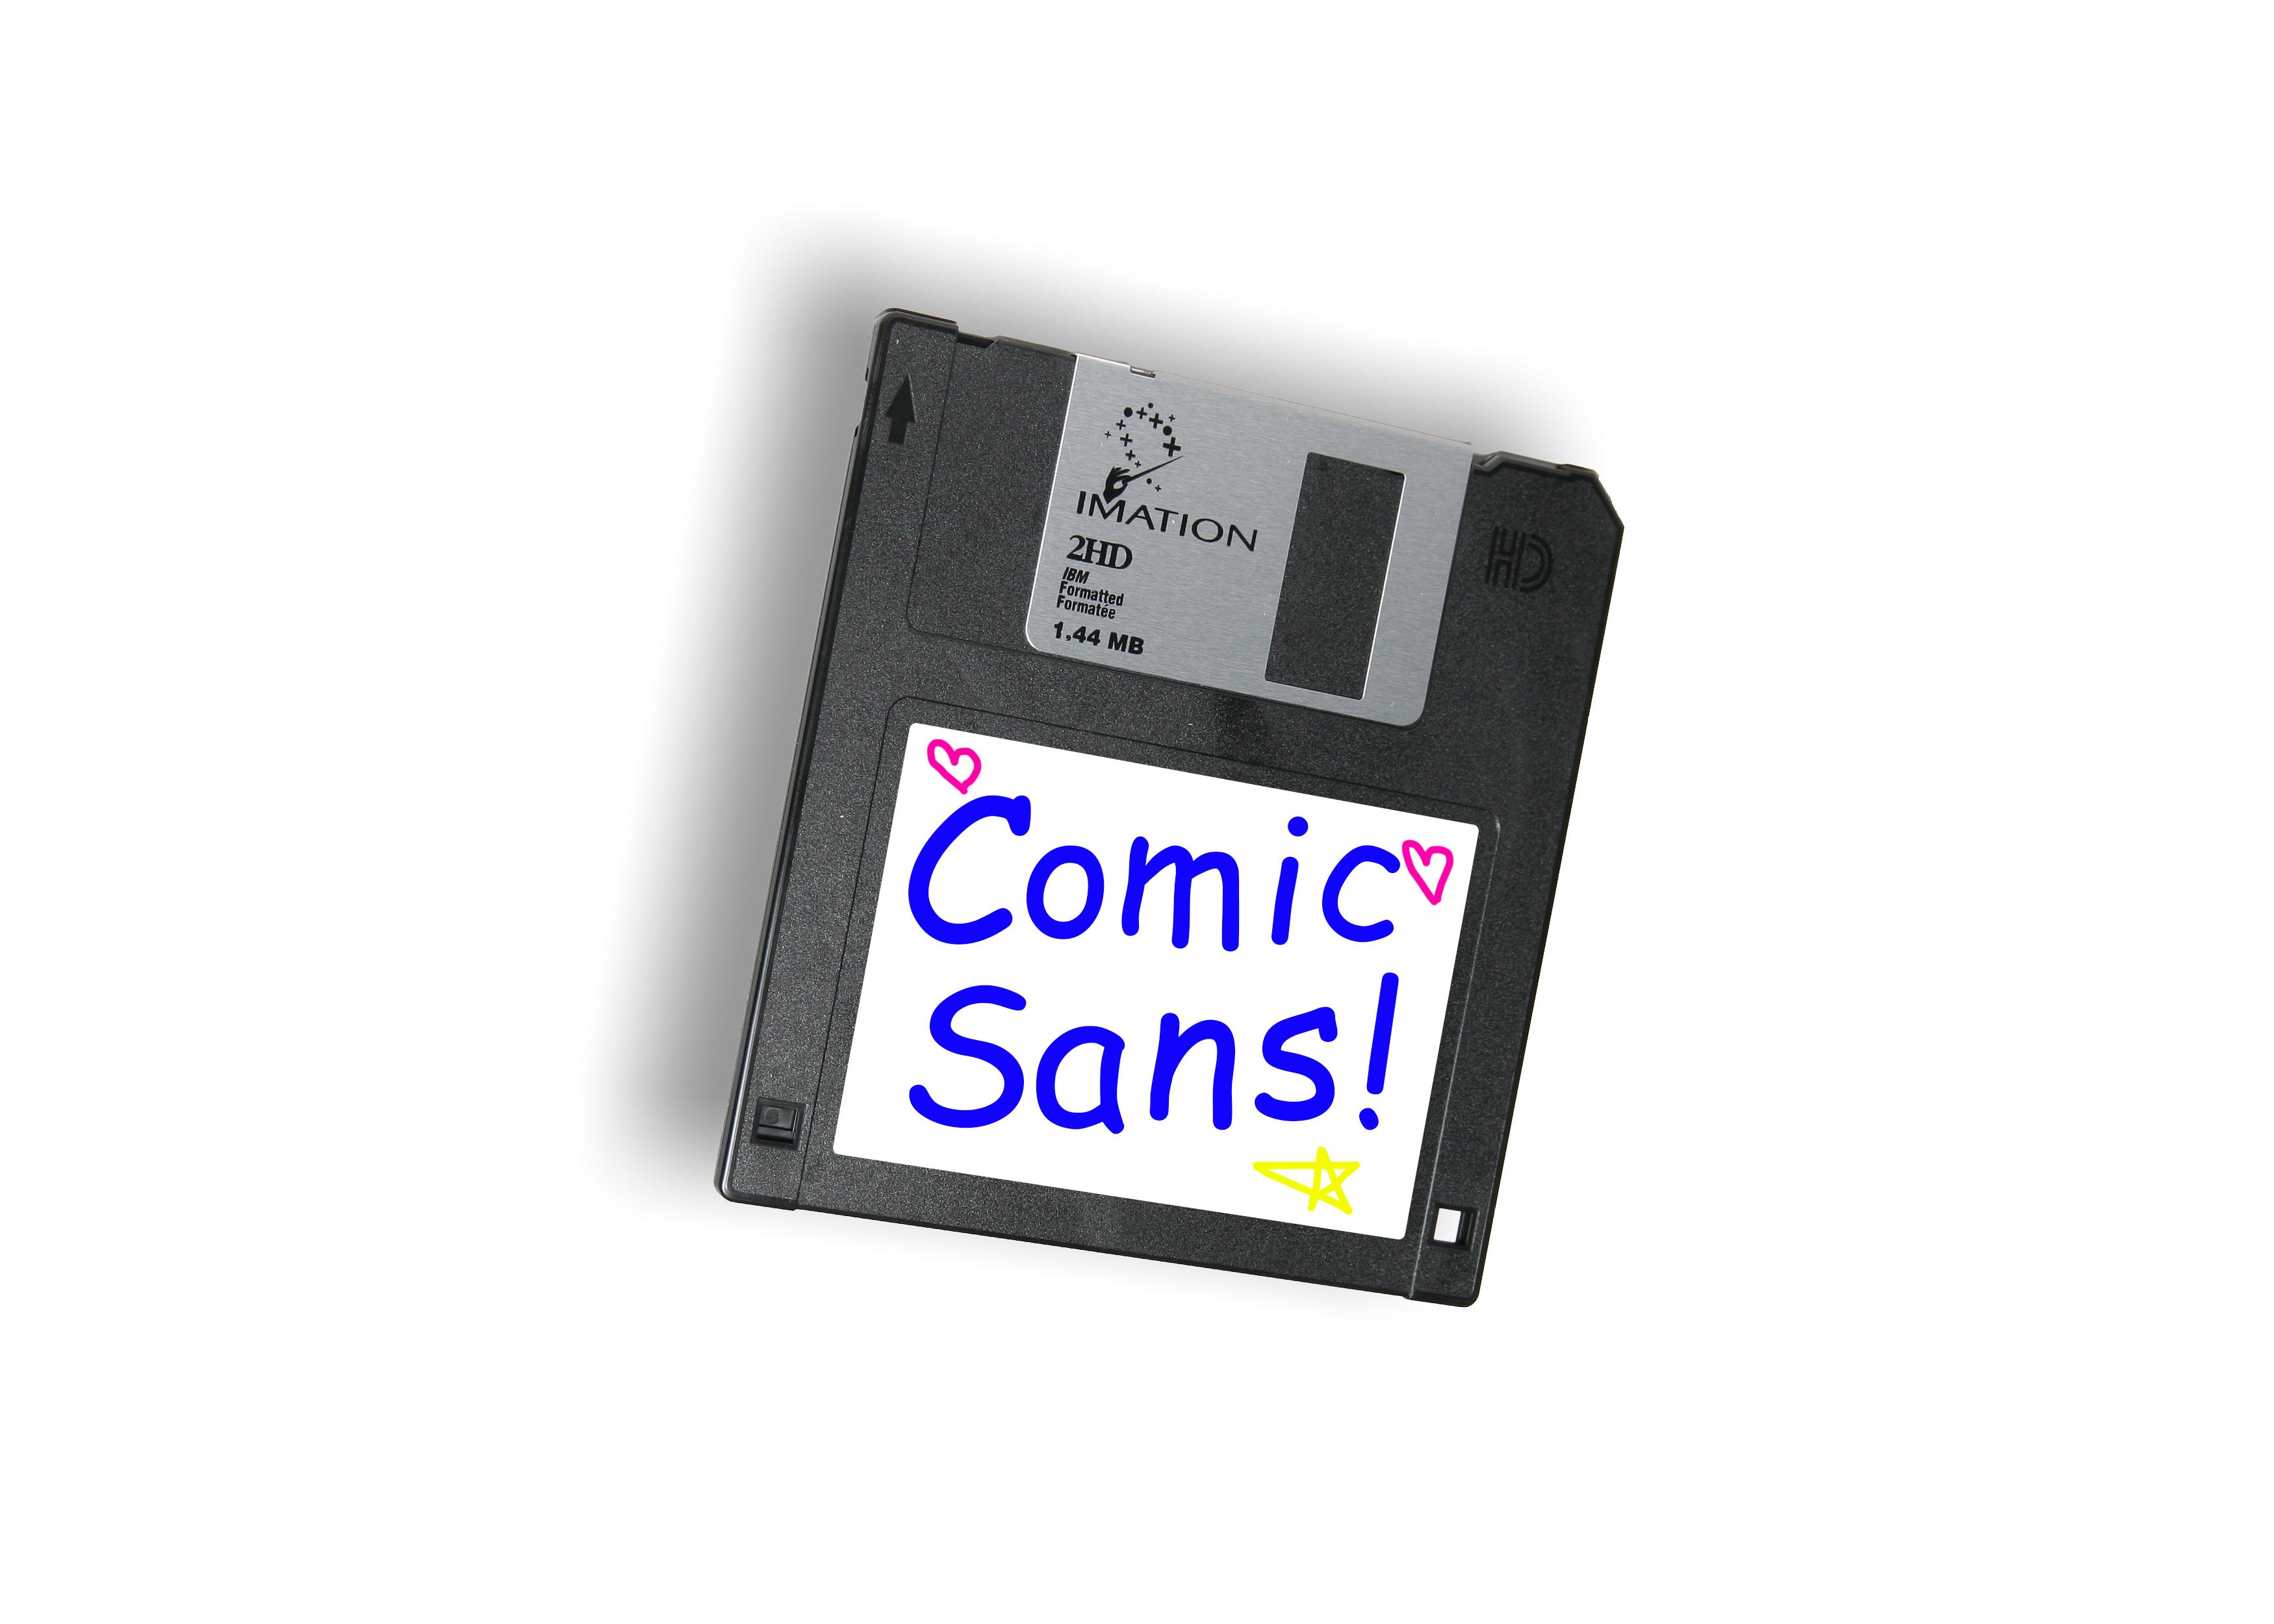 The diskette